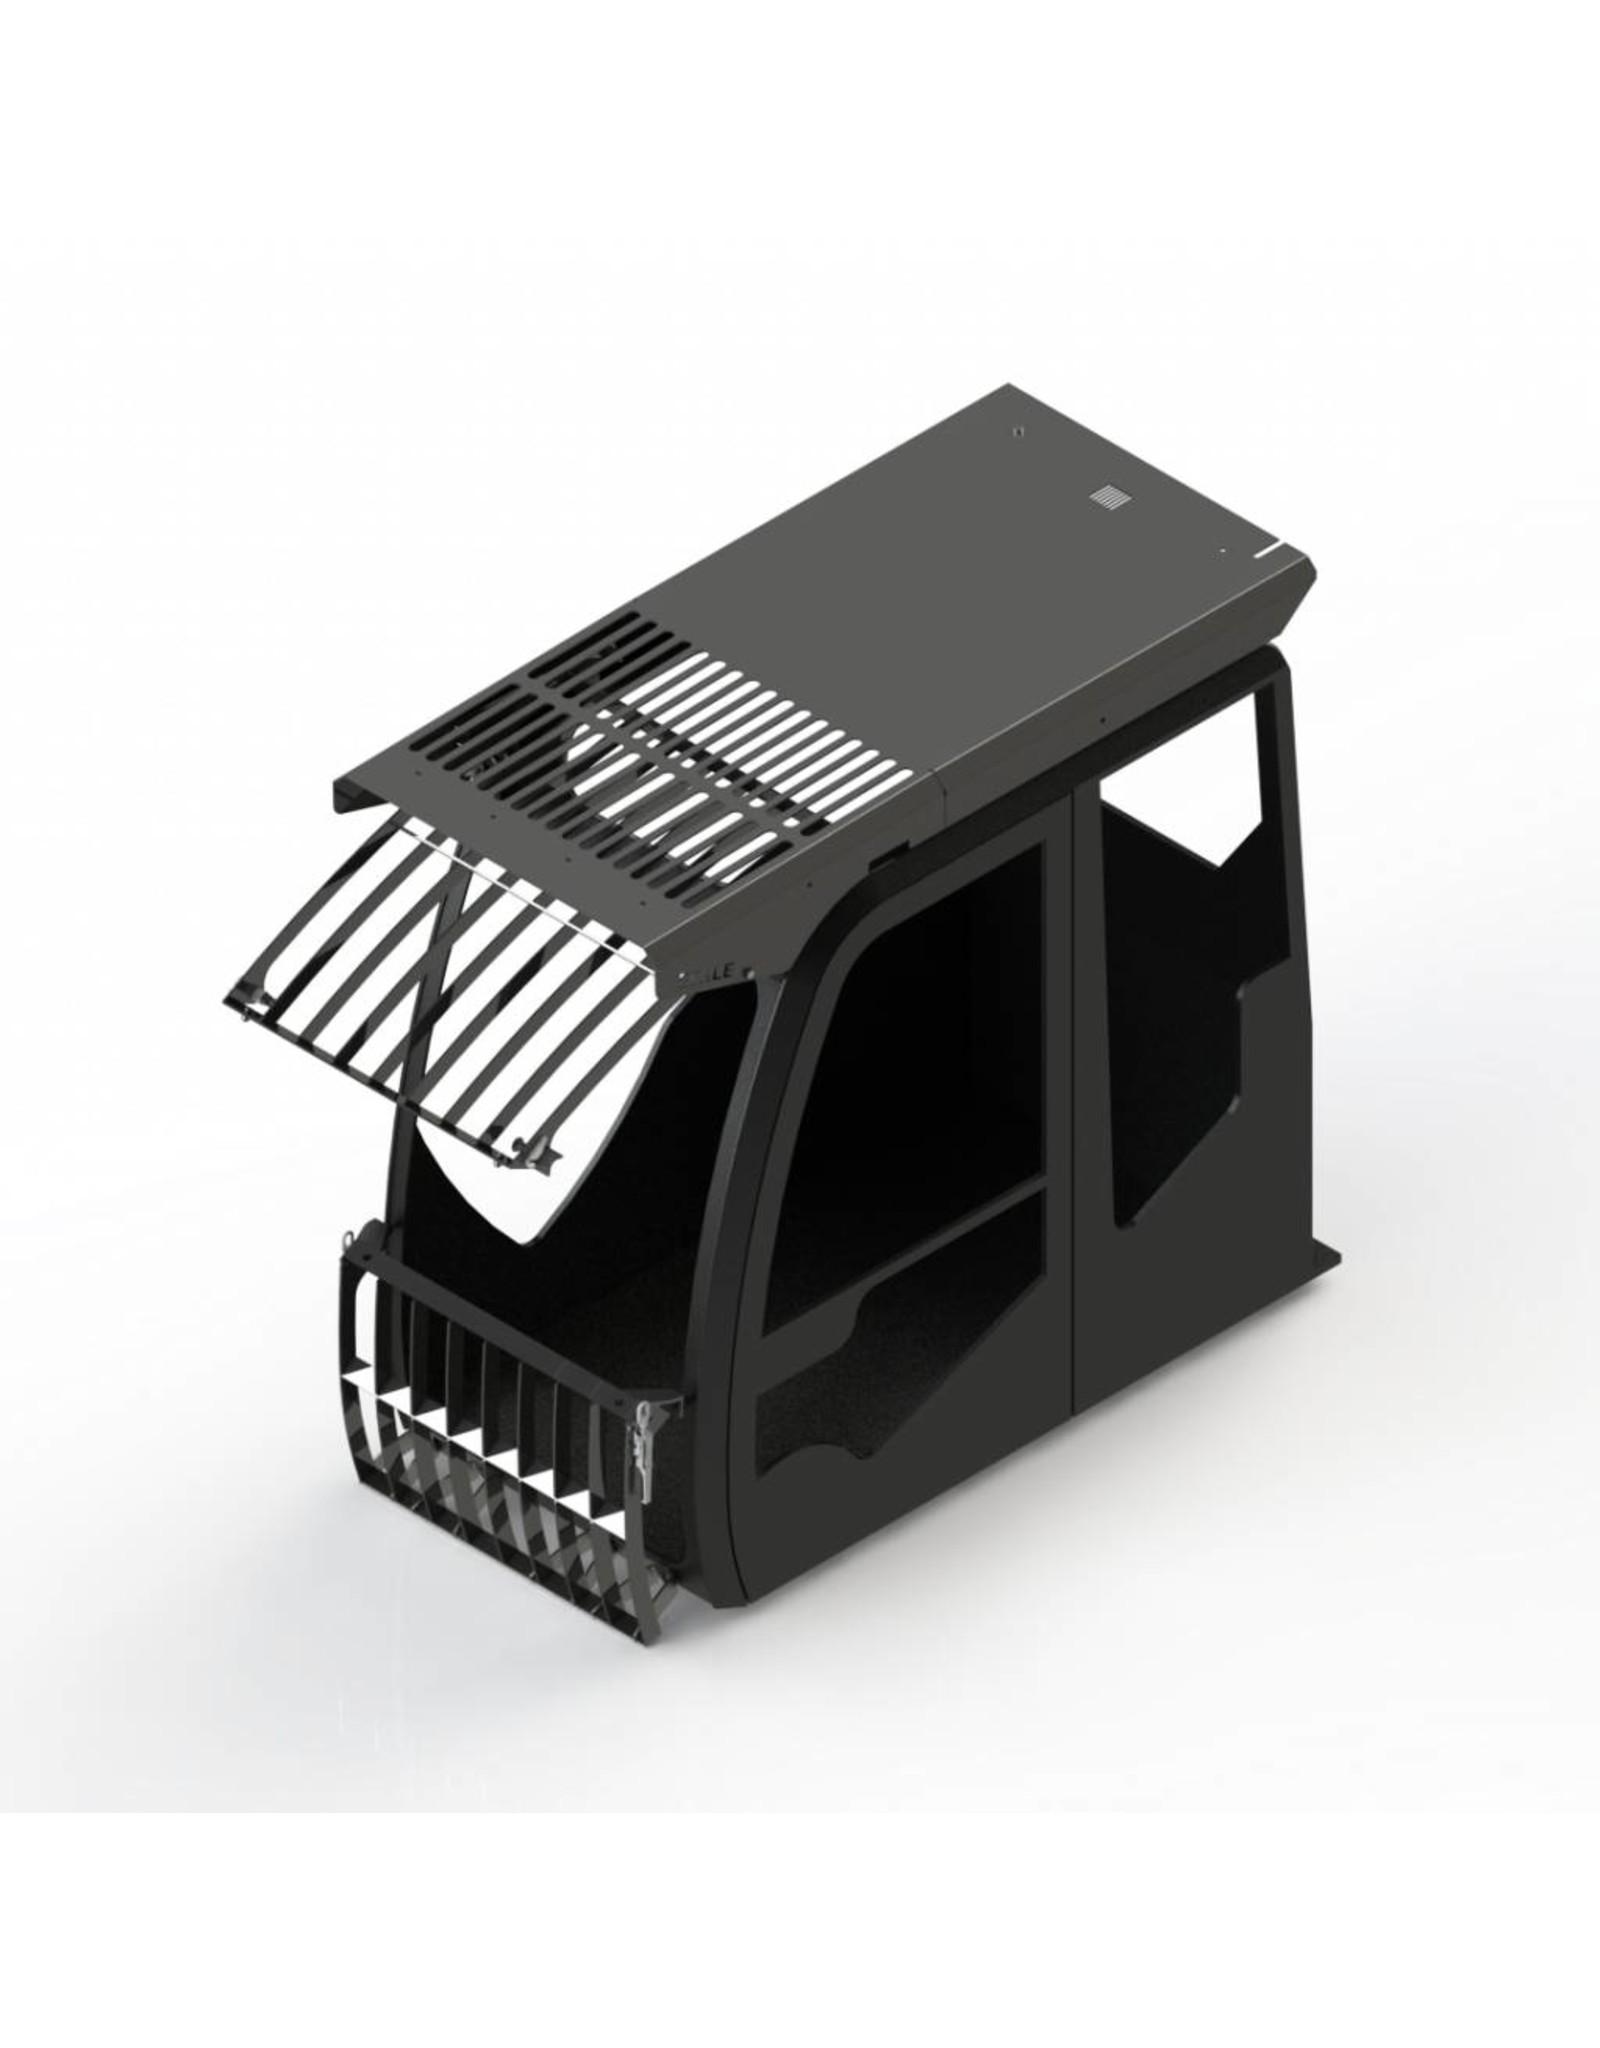 Echle Hartstahl GmbH FOPS for Sany SY265C